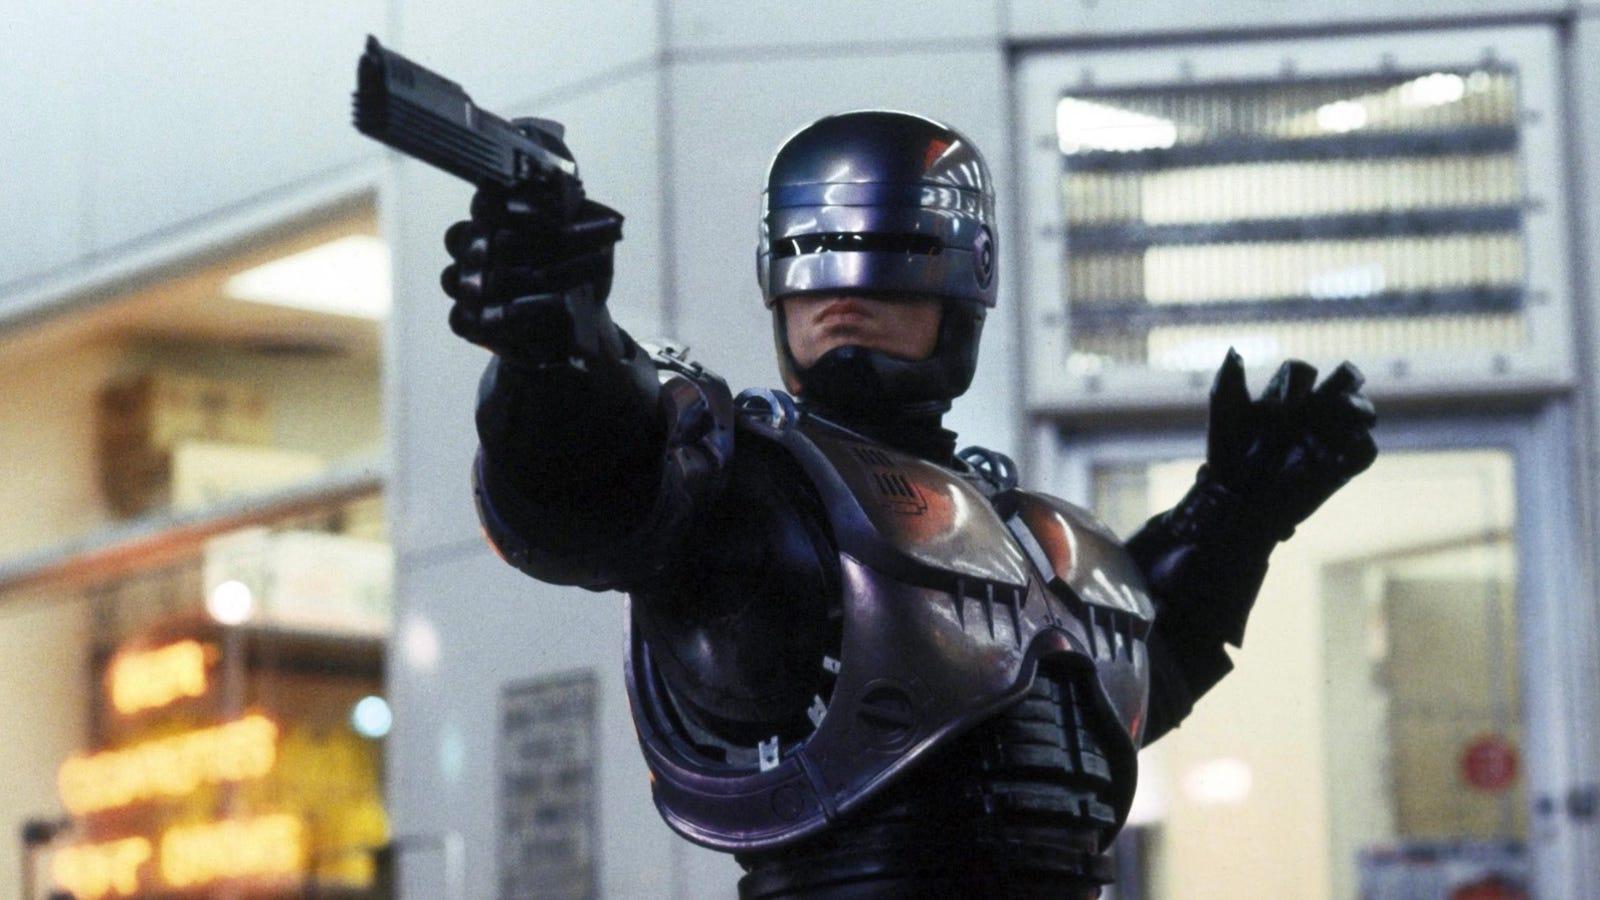 RoboCop Will Ride Again in RoboCop Returns From Director Neill Blomkamp